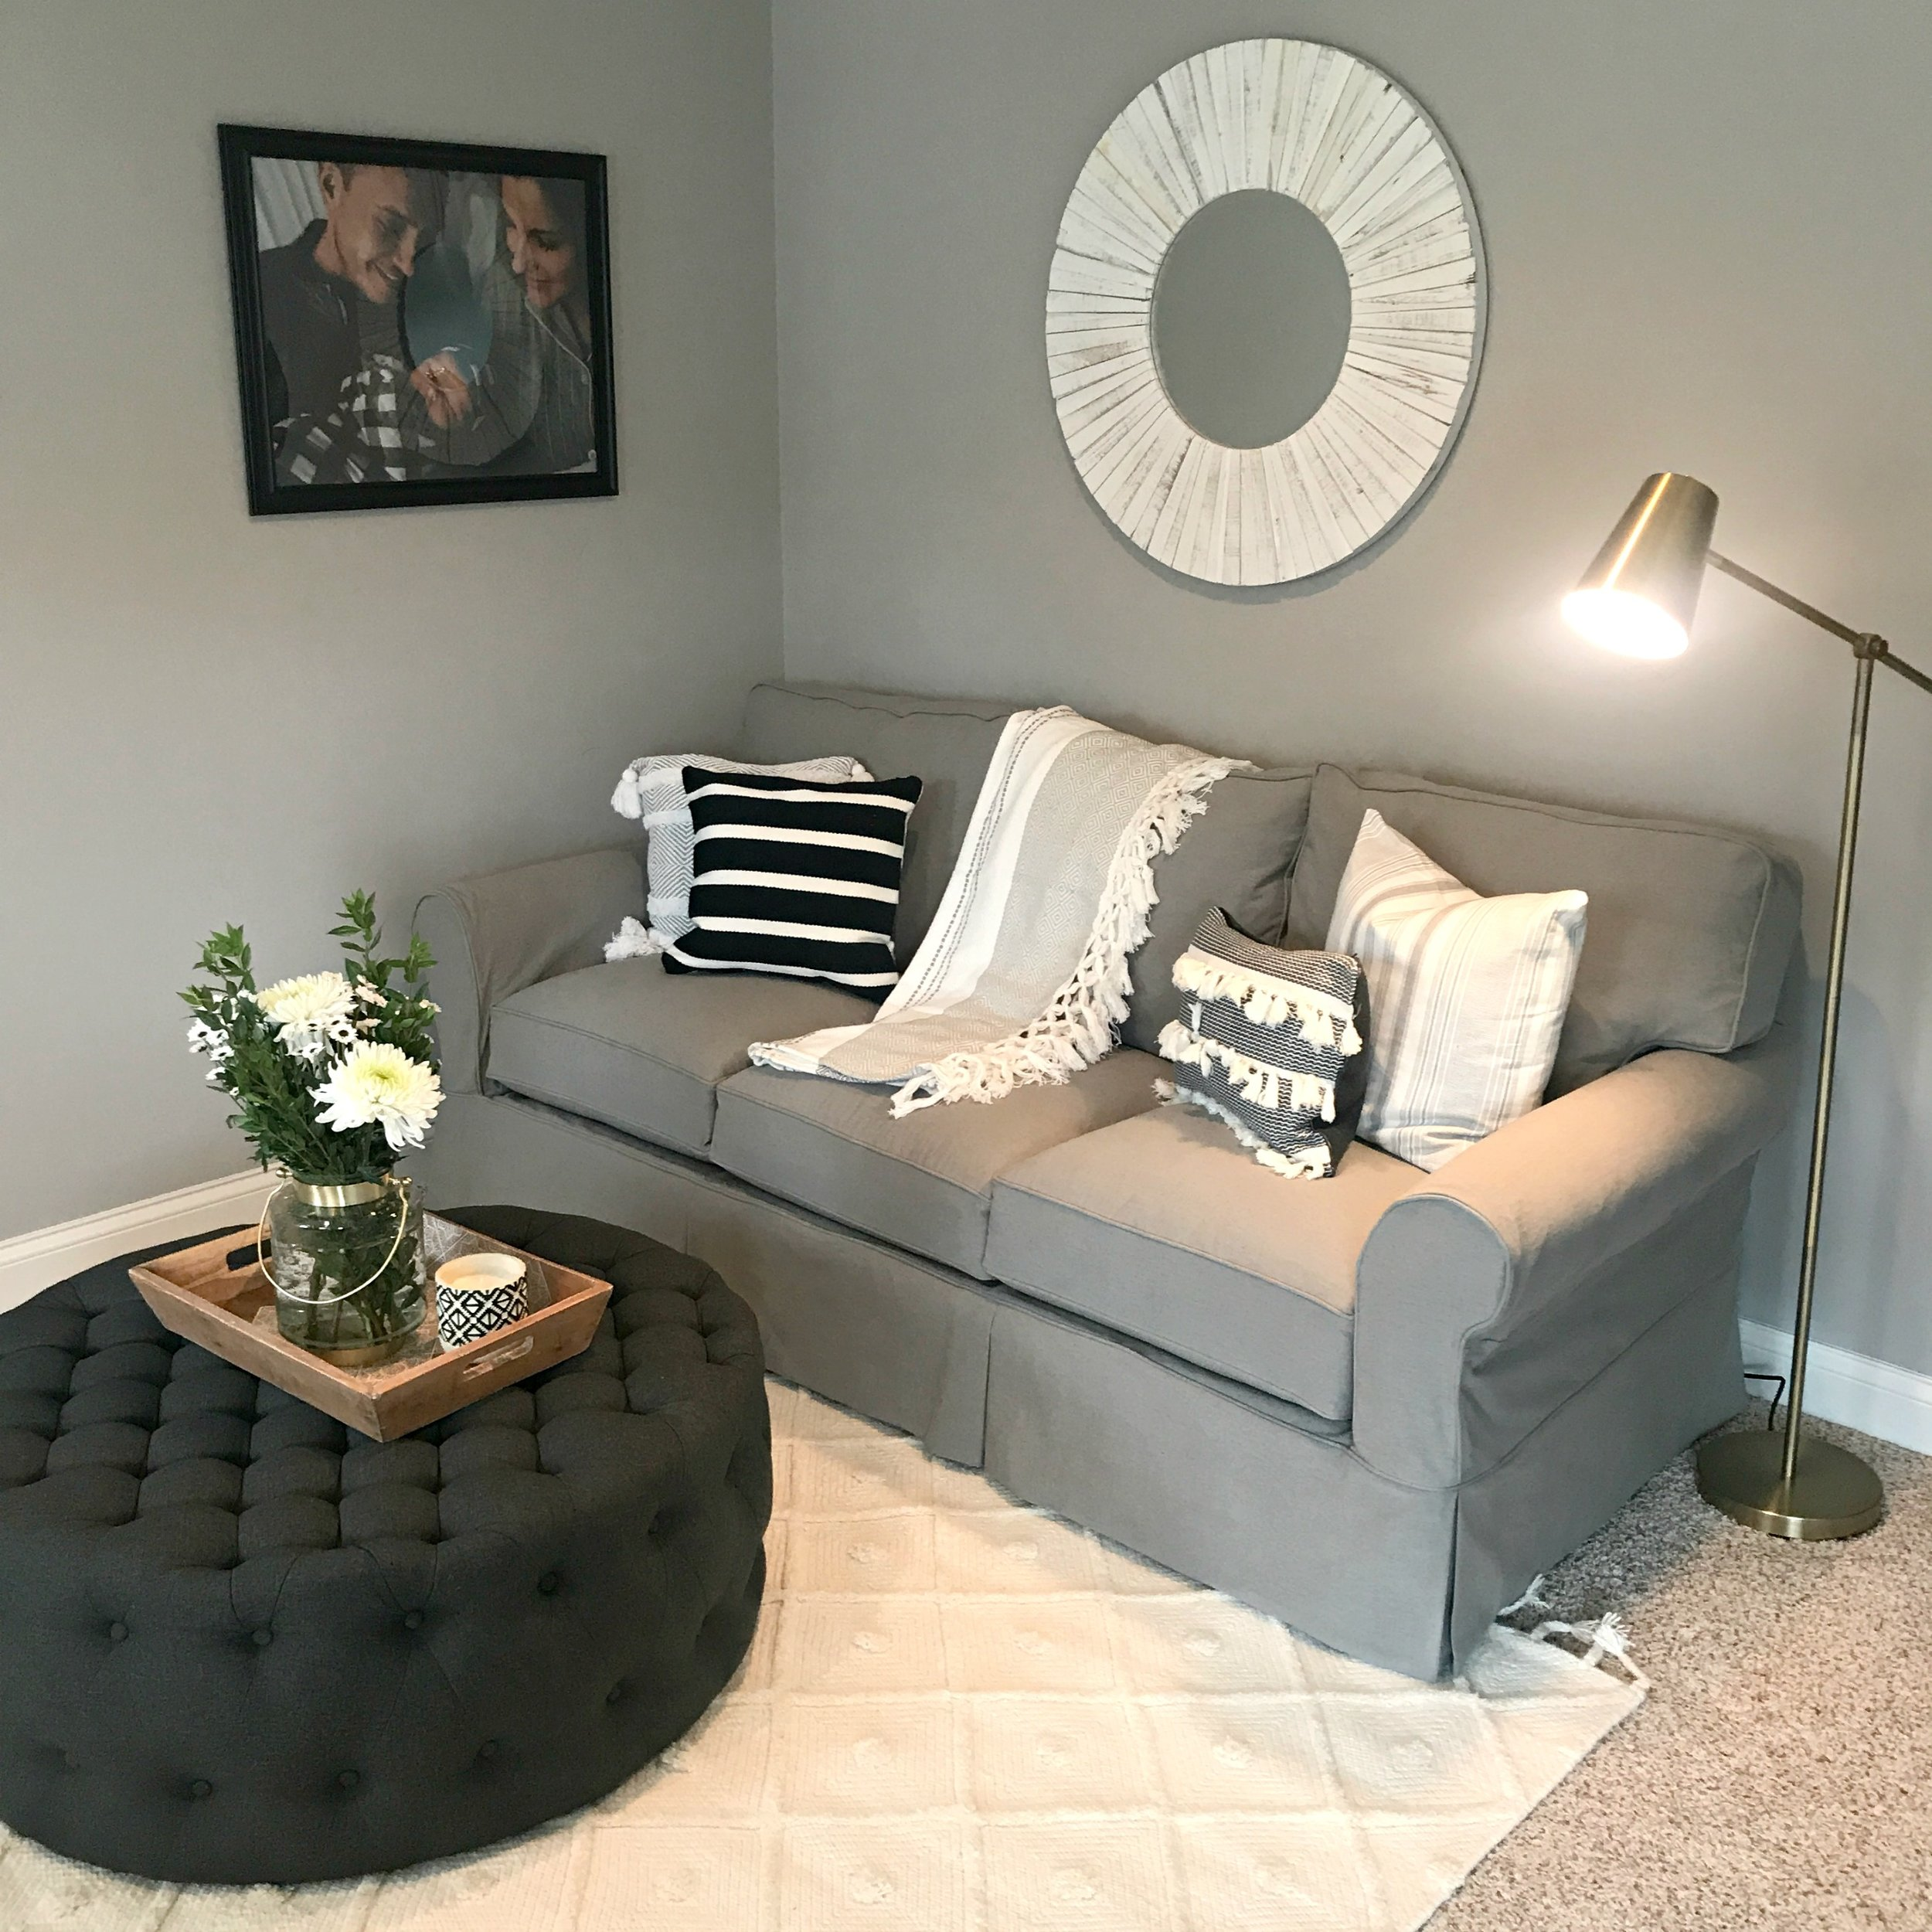 ottoman  |  rug   | couch- Arhaus  | pillows-  At Home ,  Homegoods  +  Target   | throw-  Homegoods  |  lamp  | accessories-  Homegoods   |  mirror